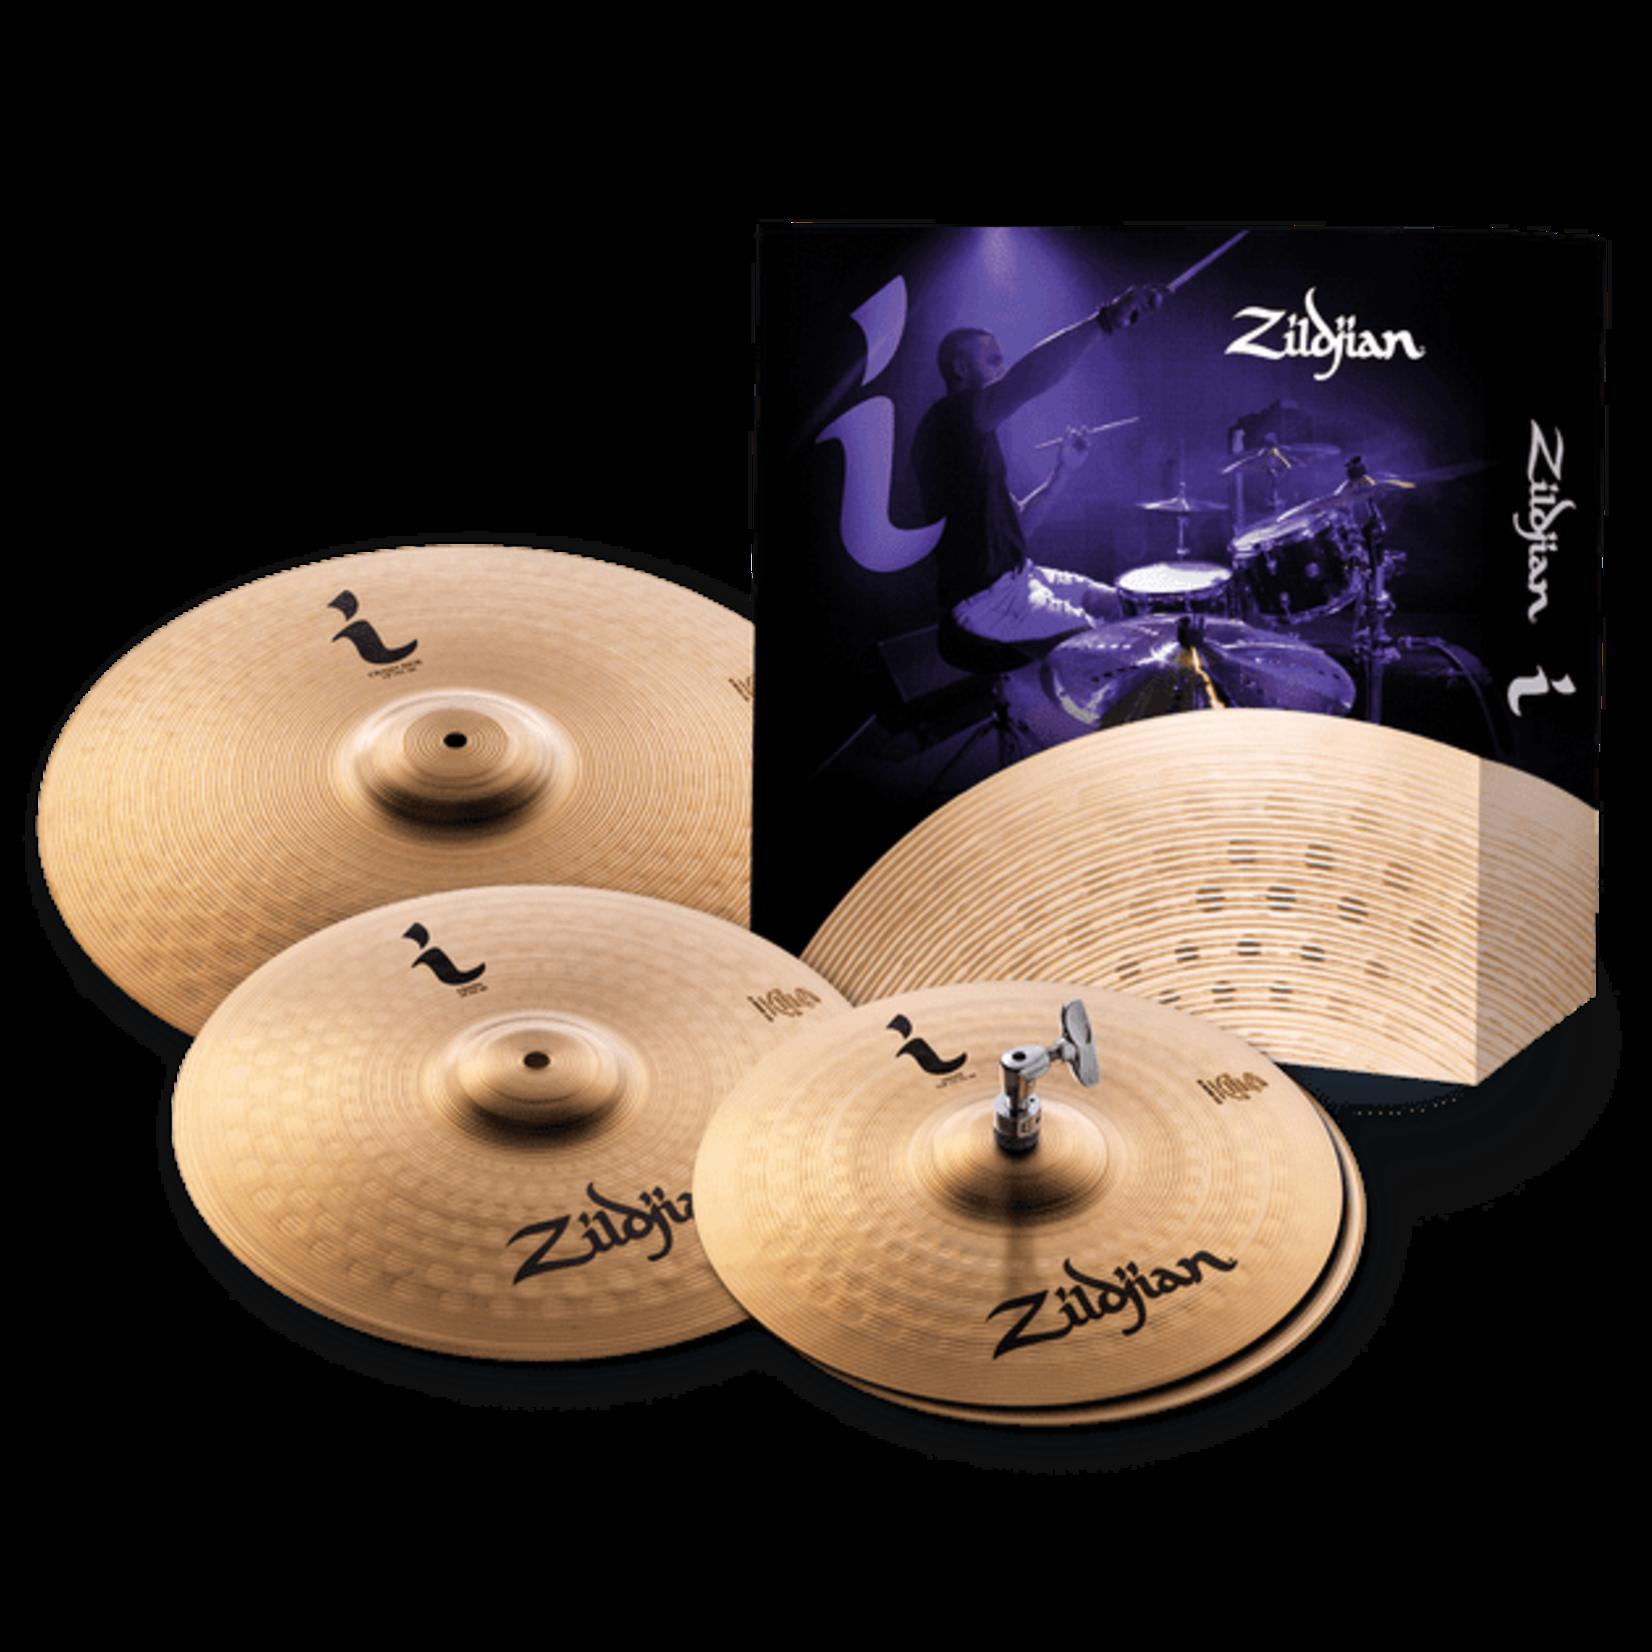 Zildjian Zildjian I Essentials Plus Cymbal Pack